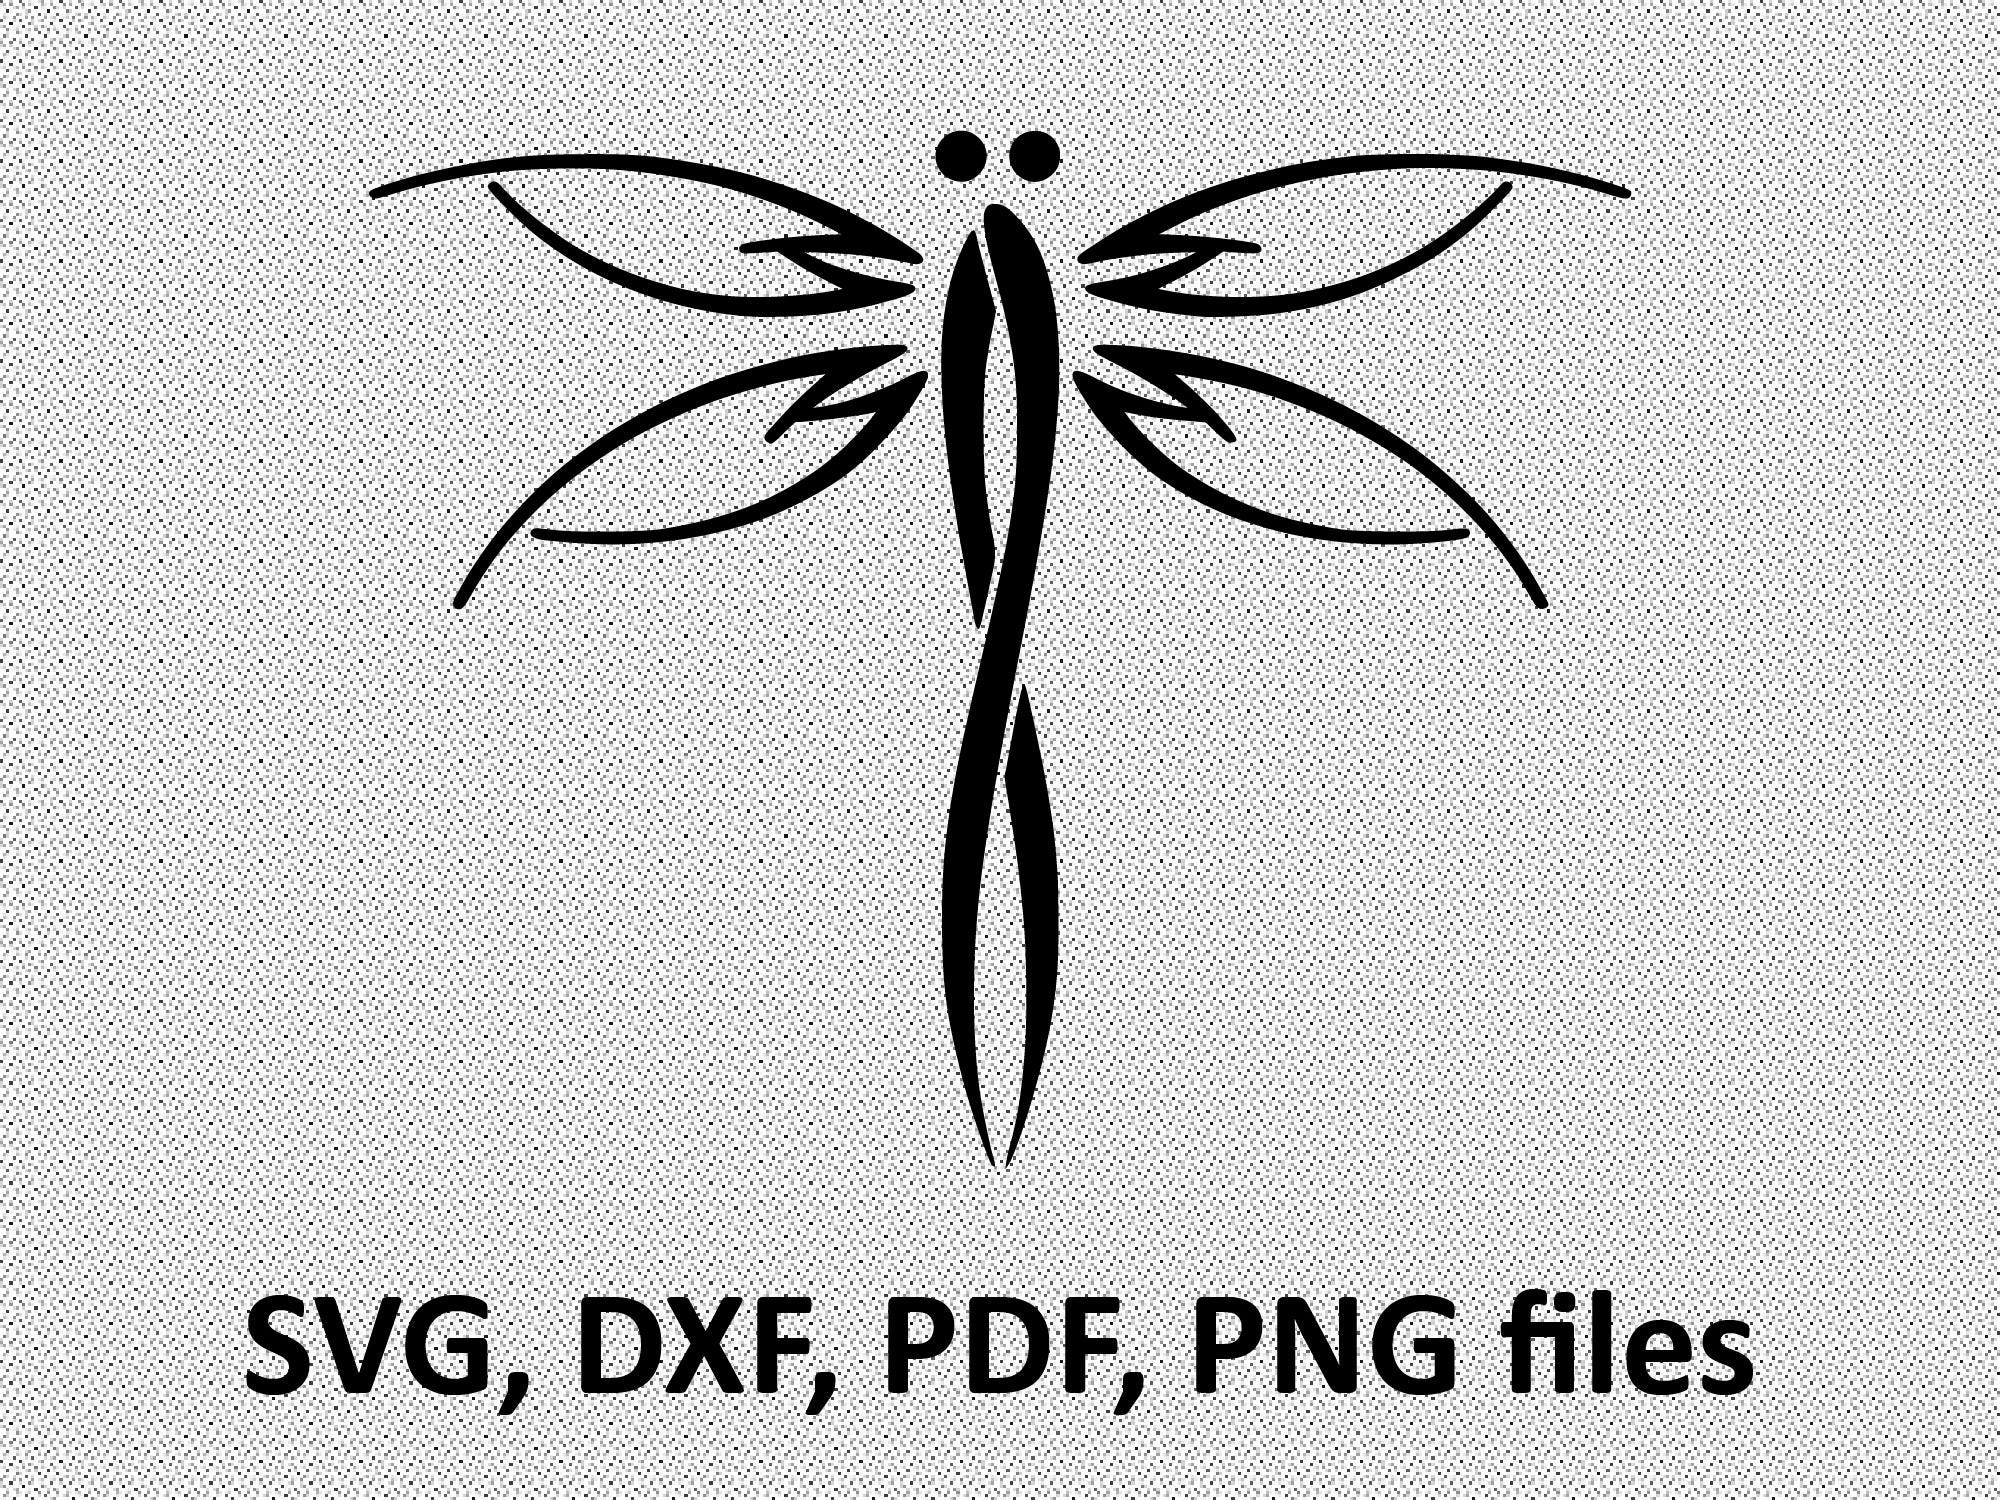 dragonfly svg dragonfly dxf dragonfly clipart dragonfly etsy